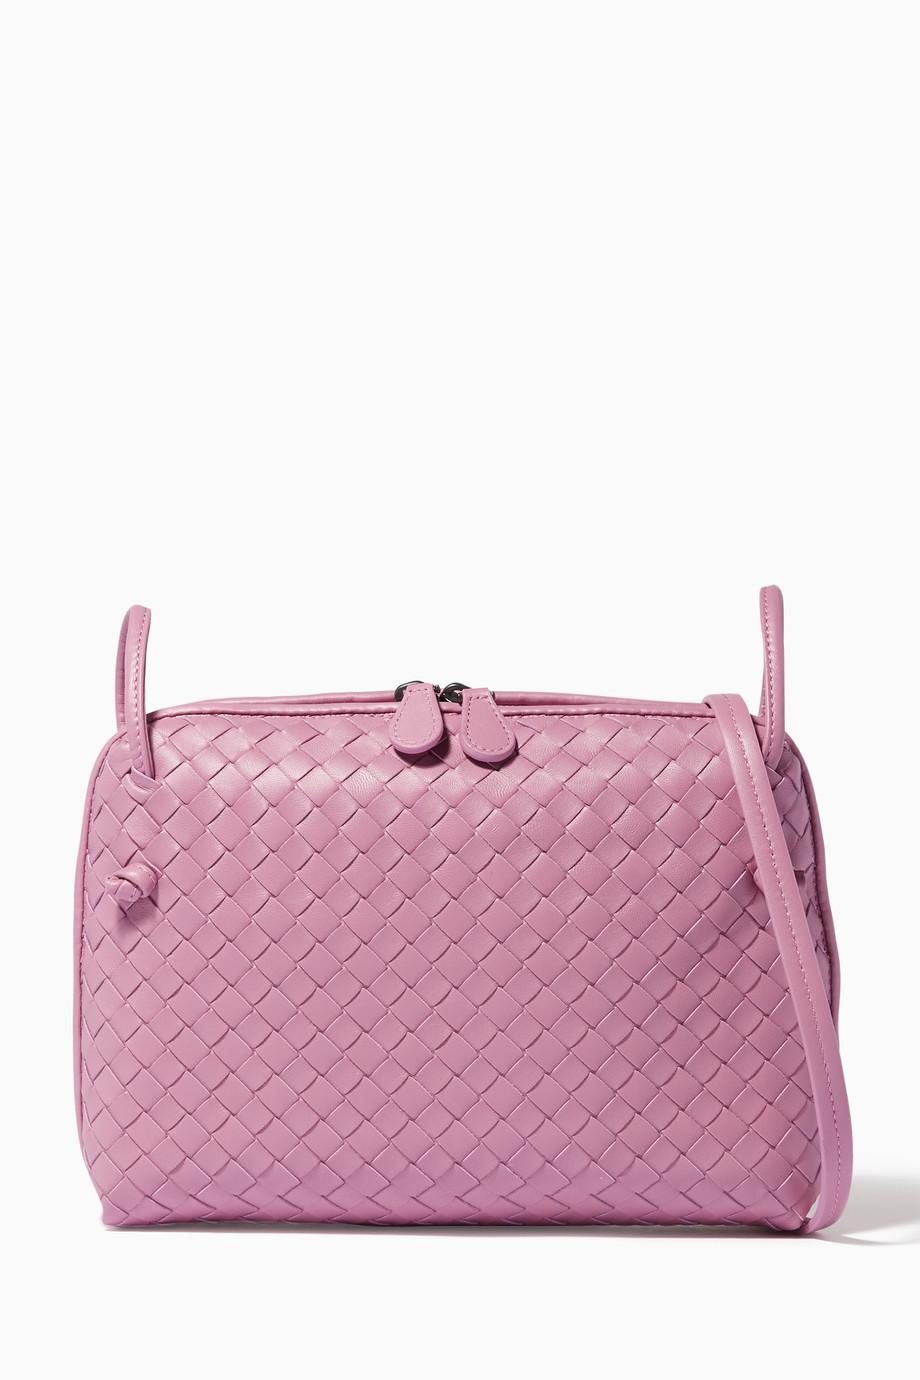 a0d98801aeb Shop Bottega Veneta Red Purple Double Zip Knot Messenger Bag for ...